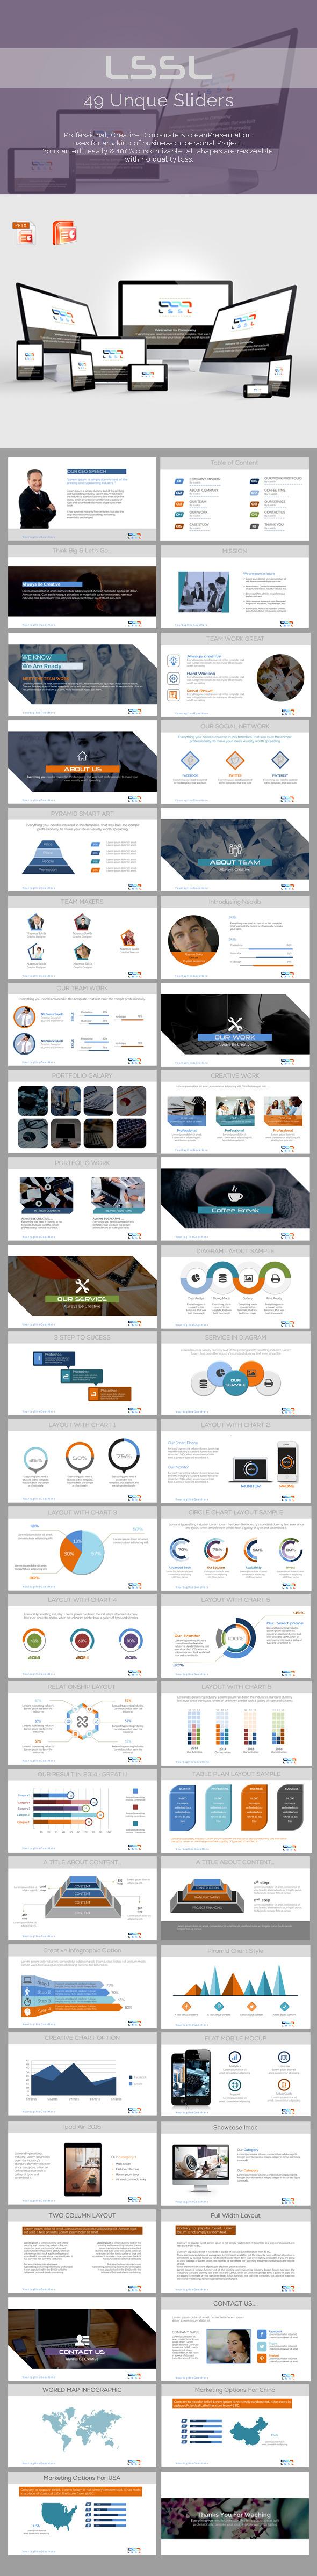 LSSL Powerpoint Presentation Template - Business PowerPoint Templates